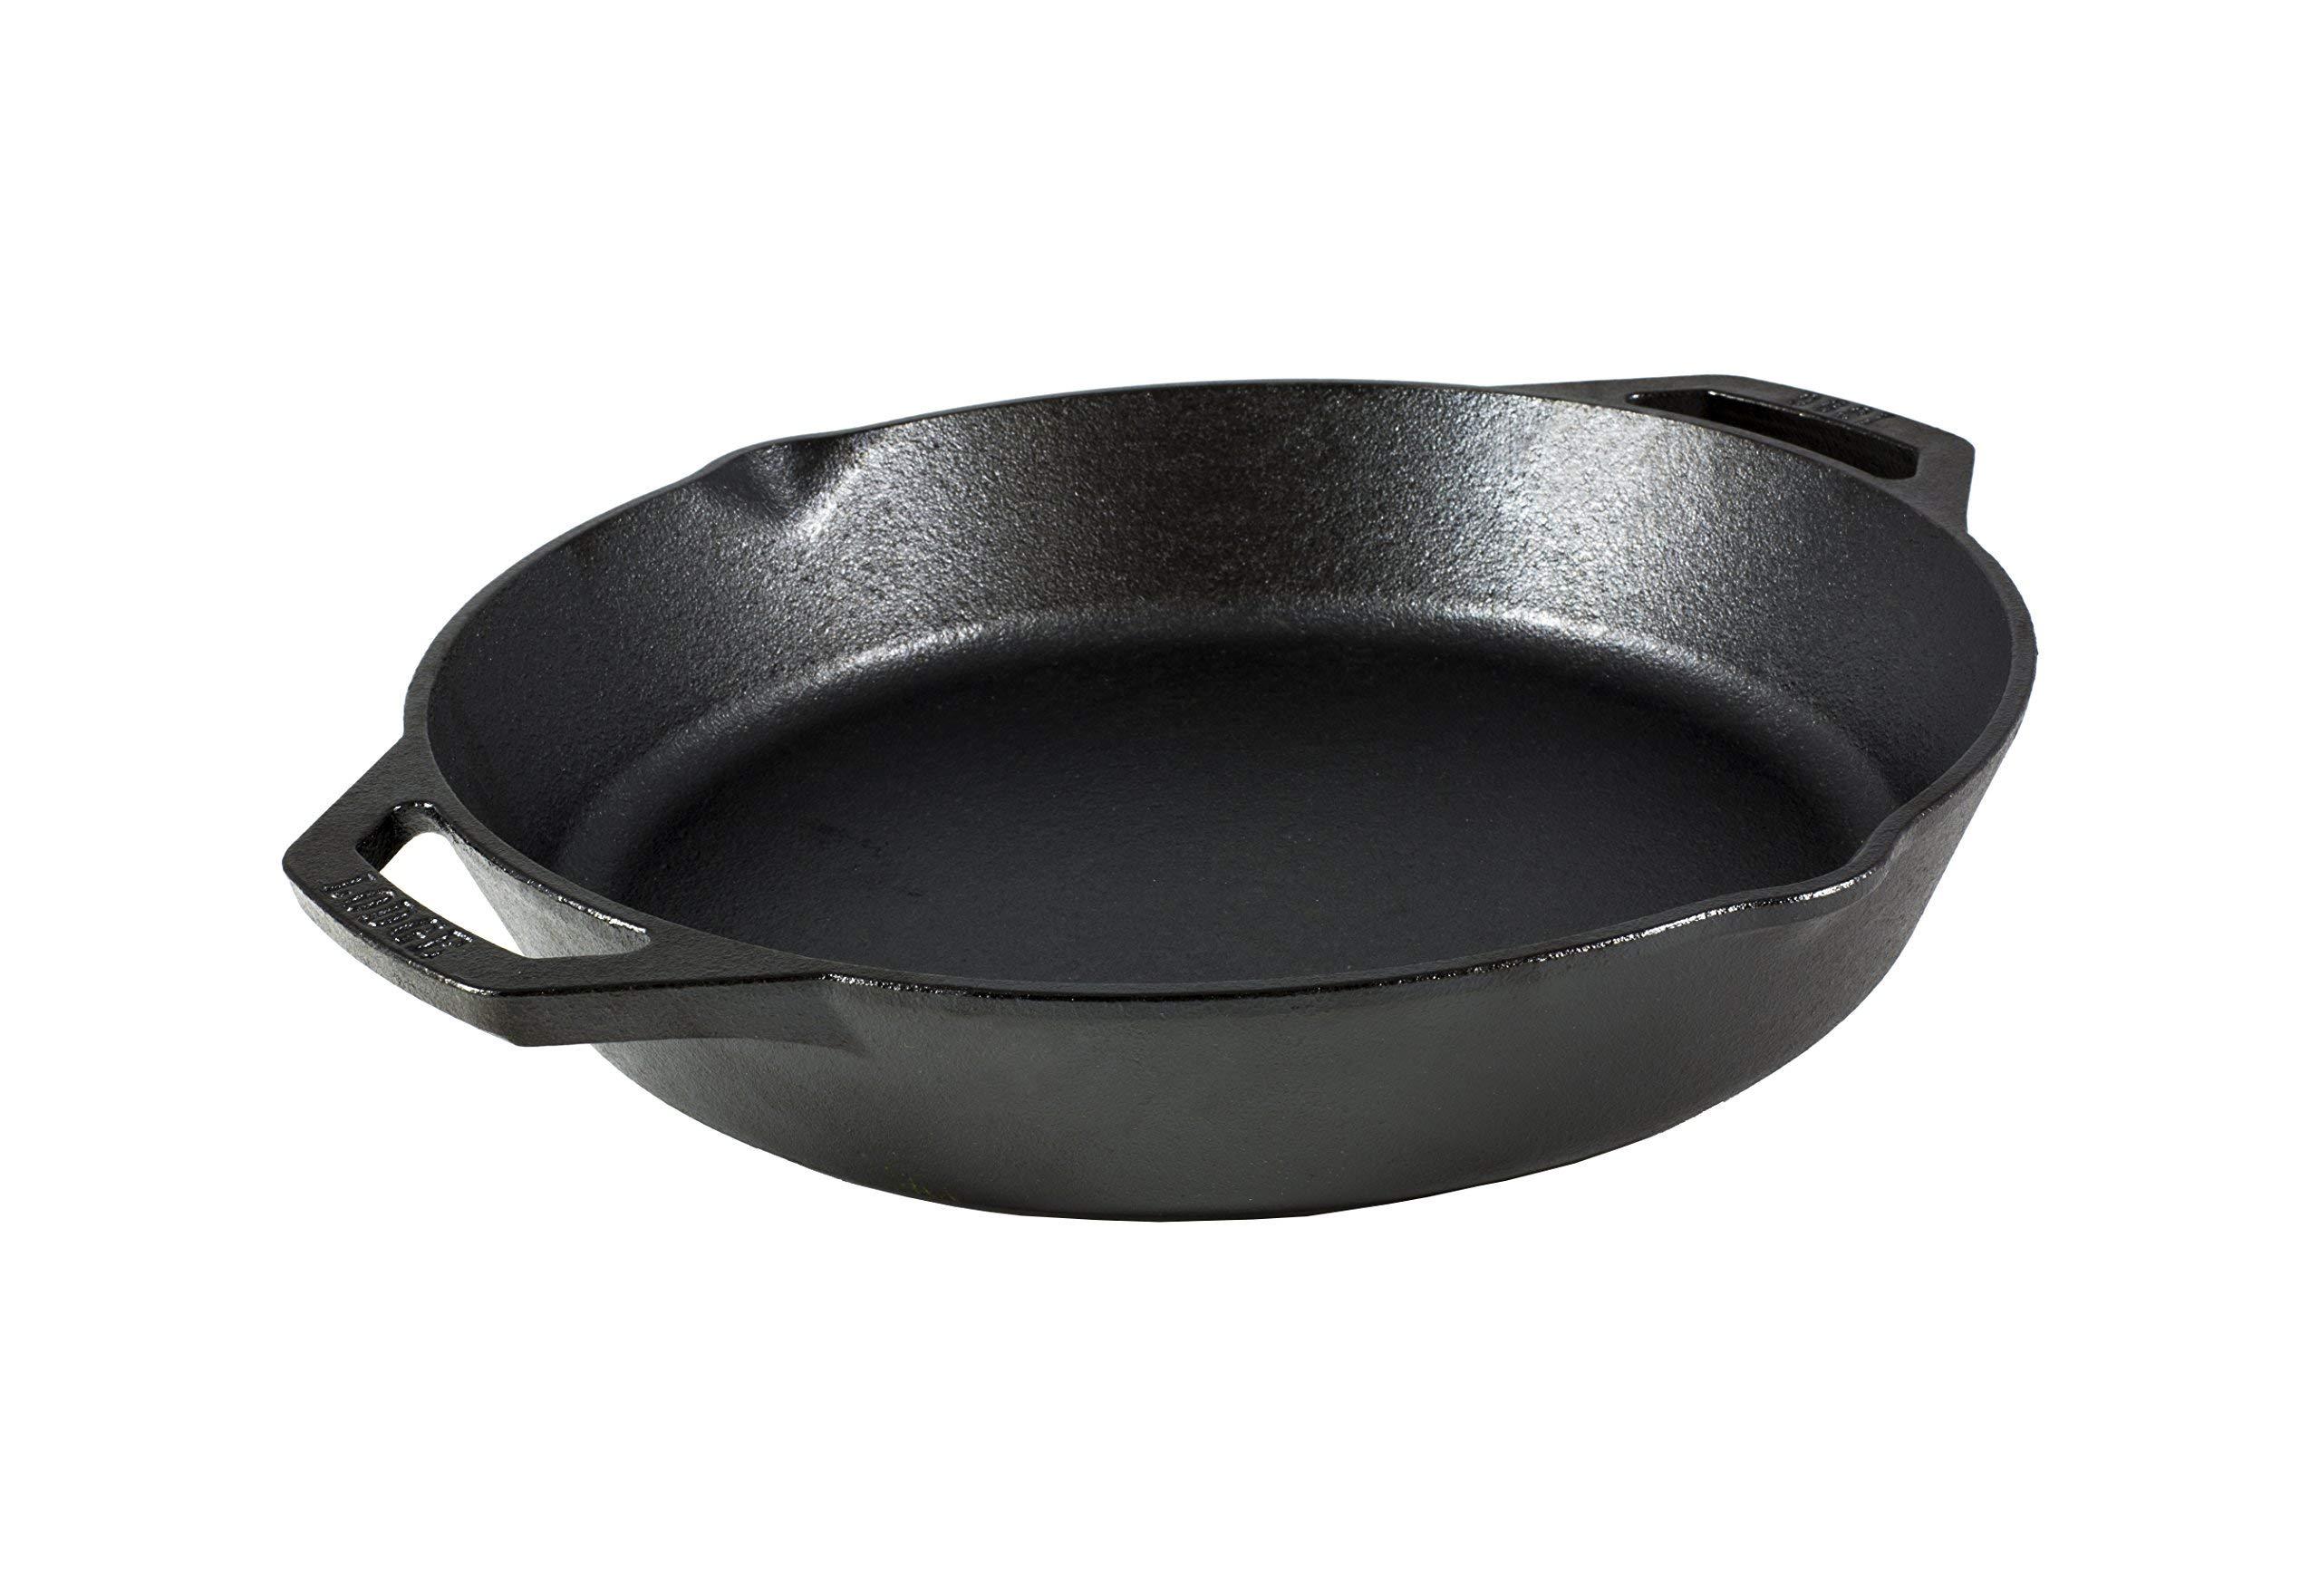 Lodge L10SKL Cast Iron Pan 12'' Black by Lodge (Image #1)